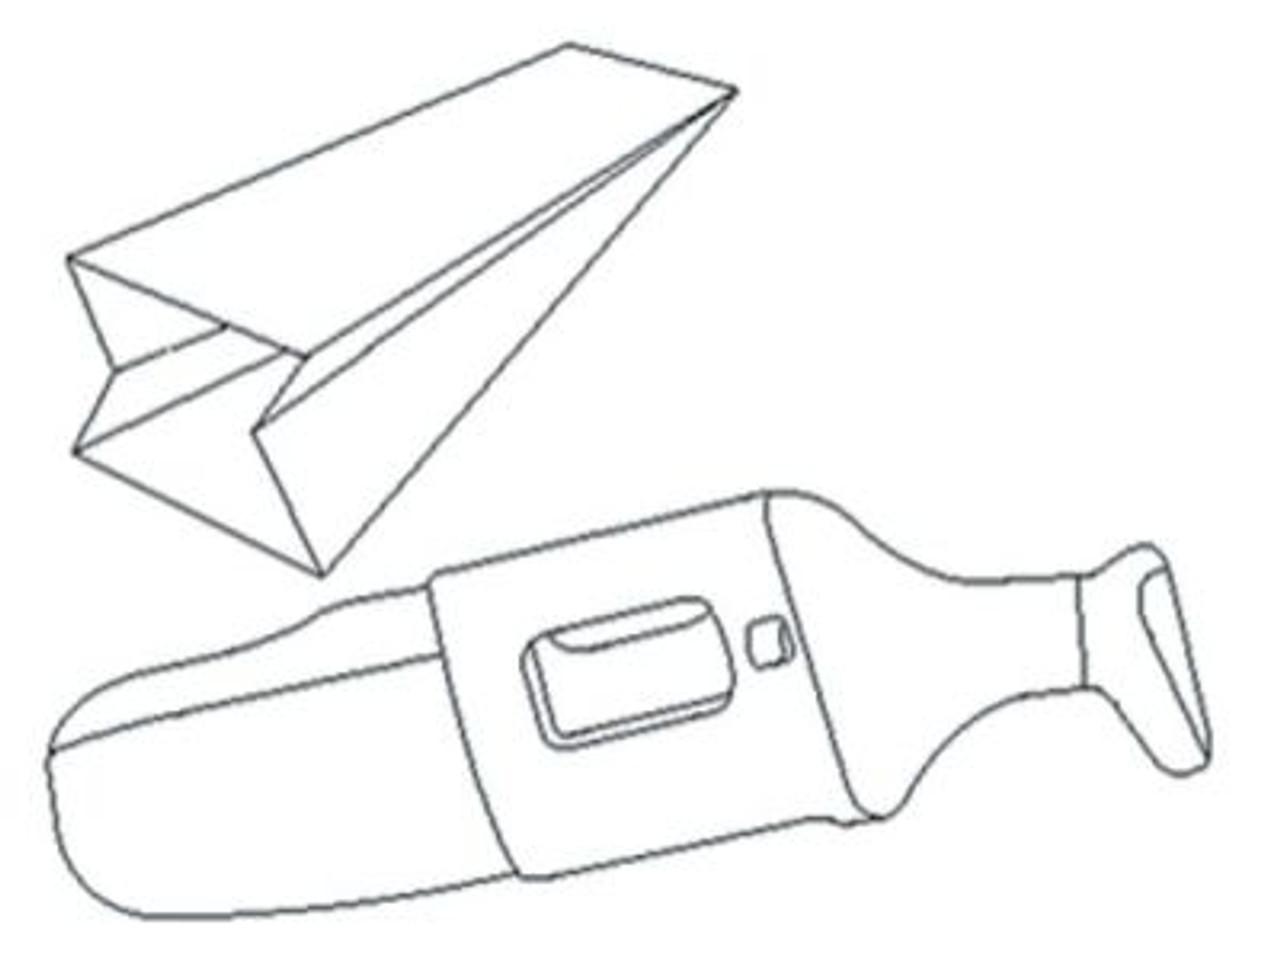 Hoover Dustette Vacuum Cleaner Bags - SDB66